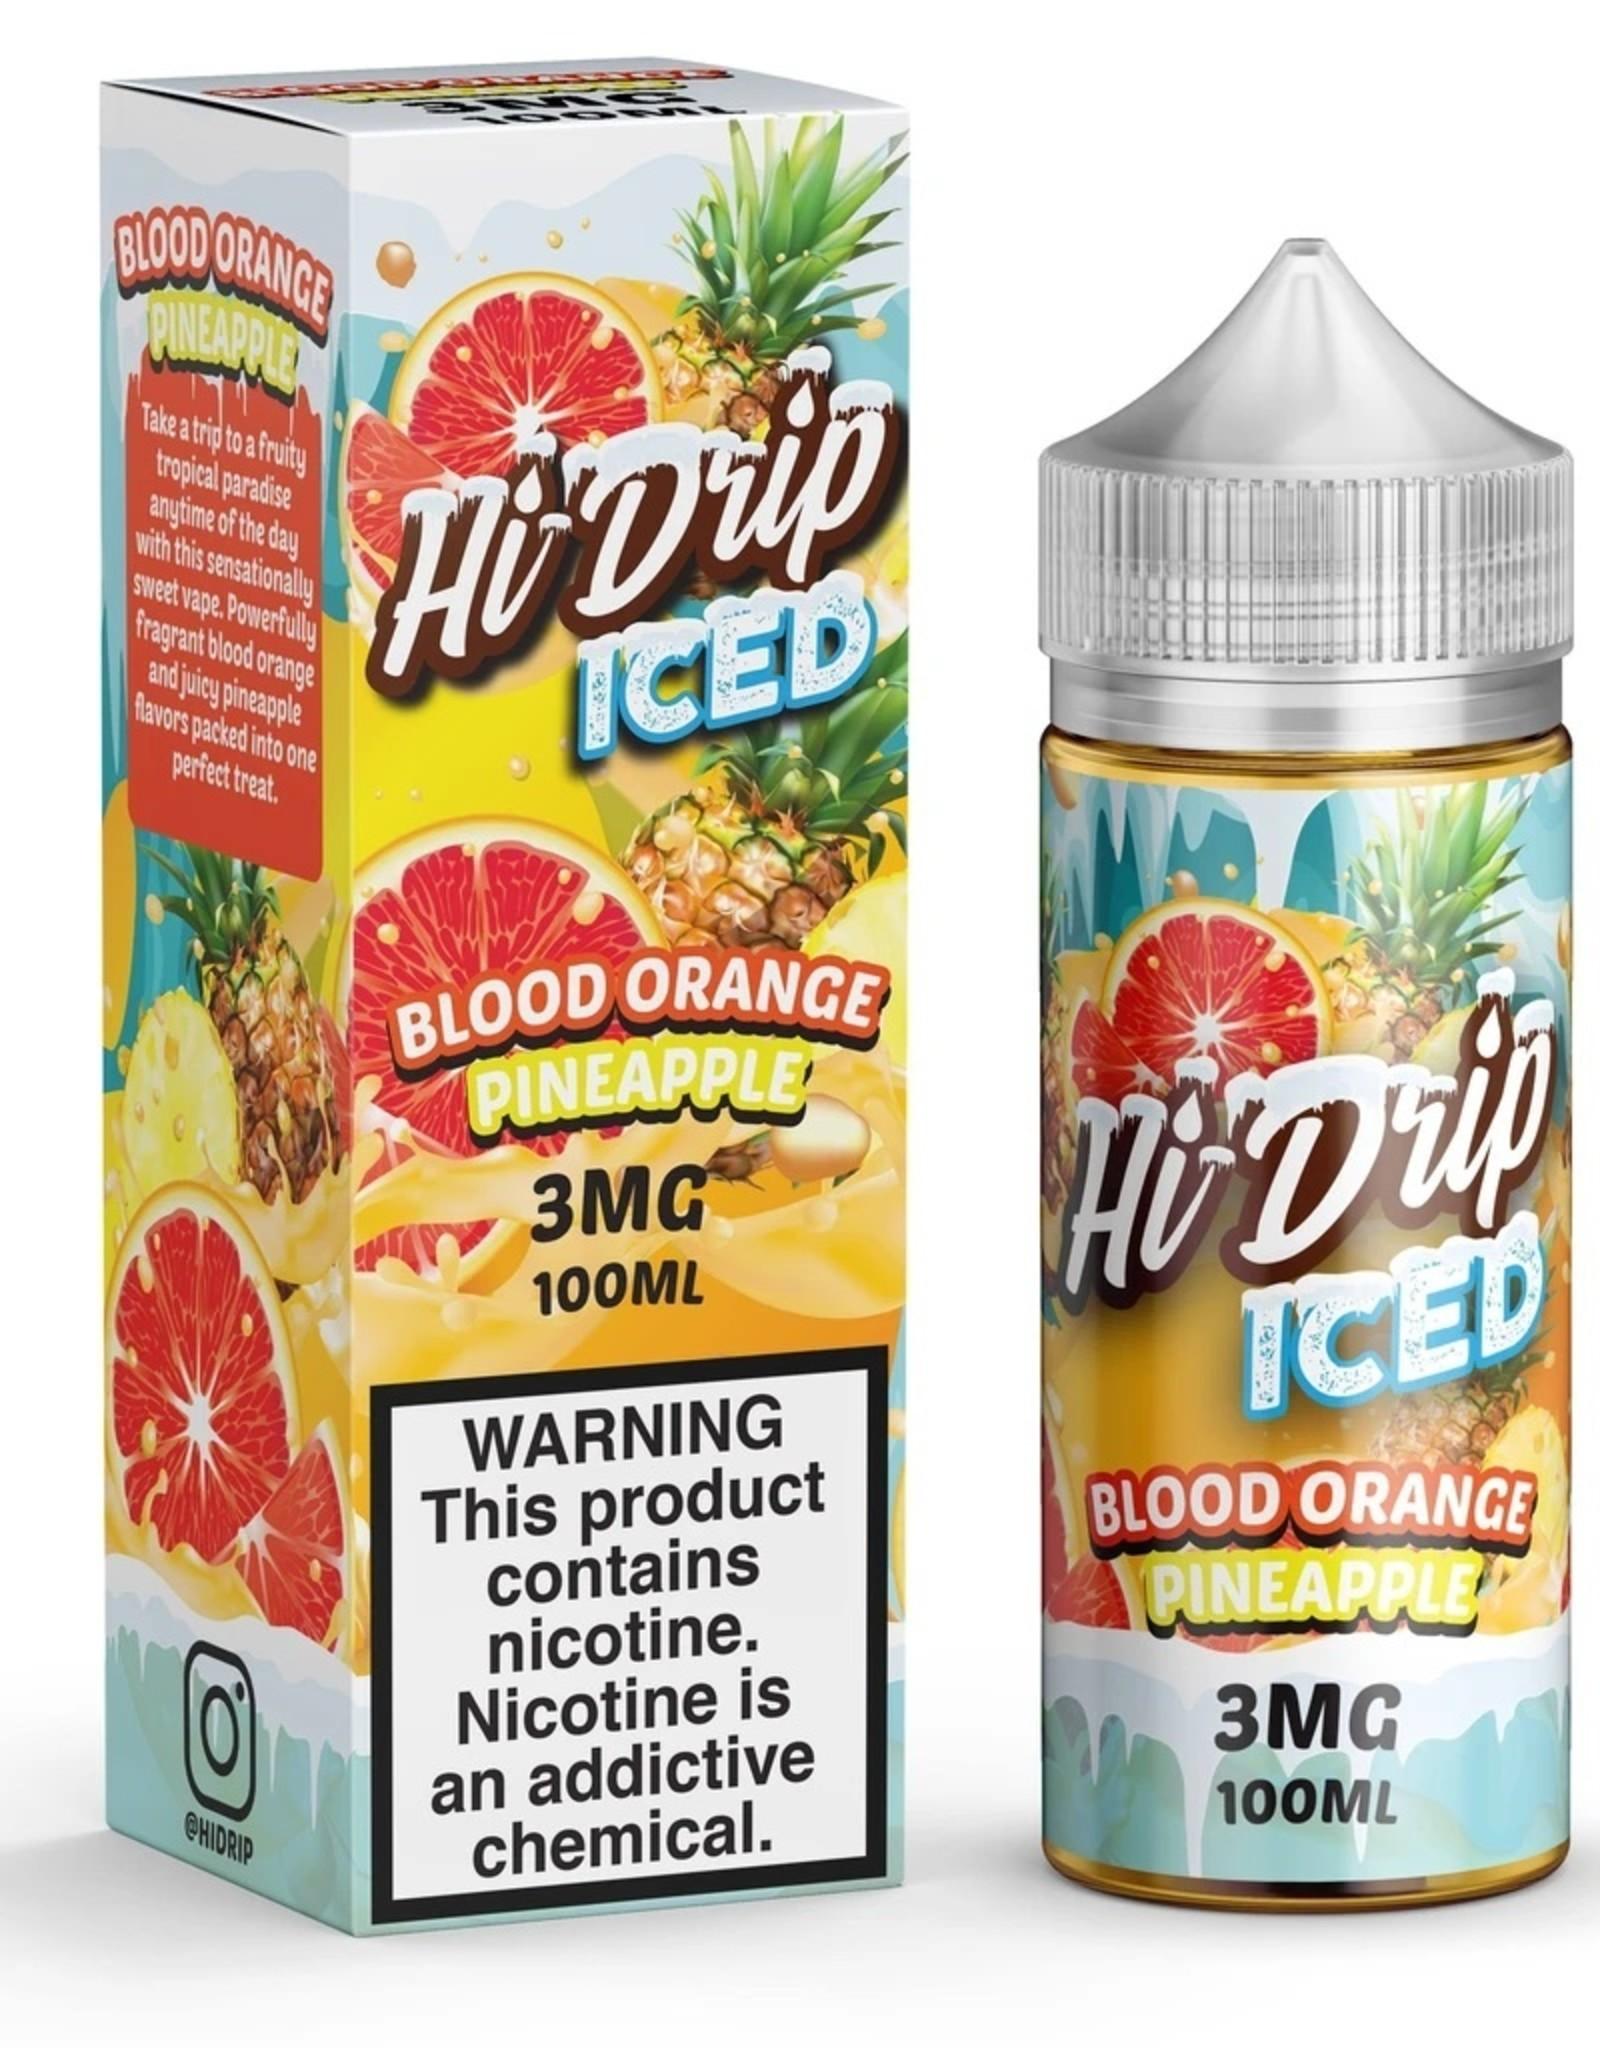 Hi-Drip Iced Blood Orange Pineapple By Hi-Drip